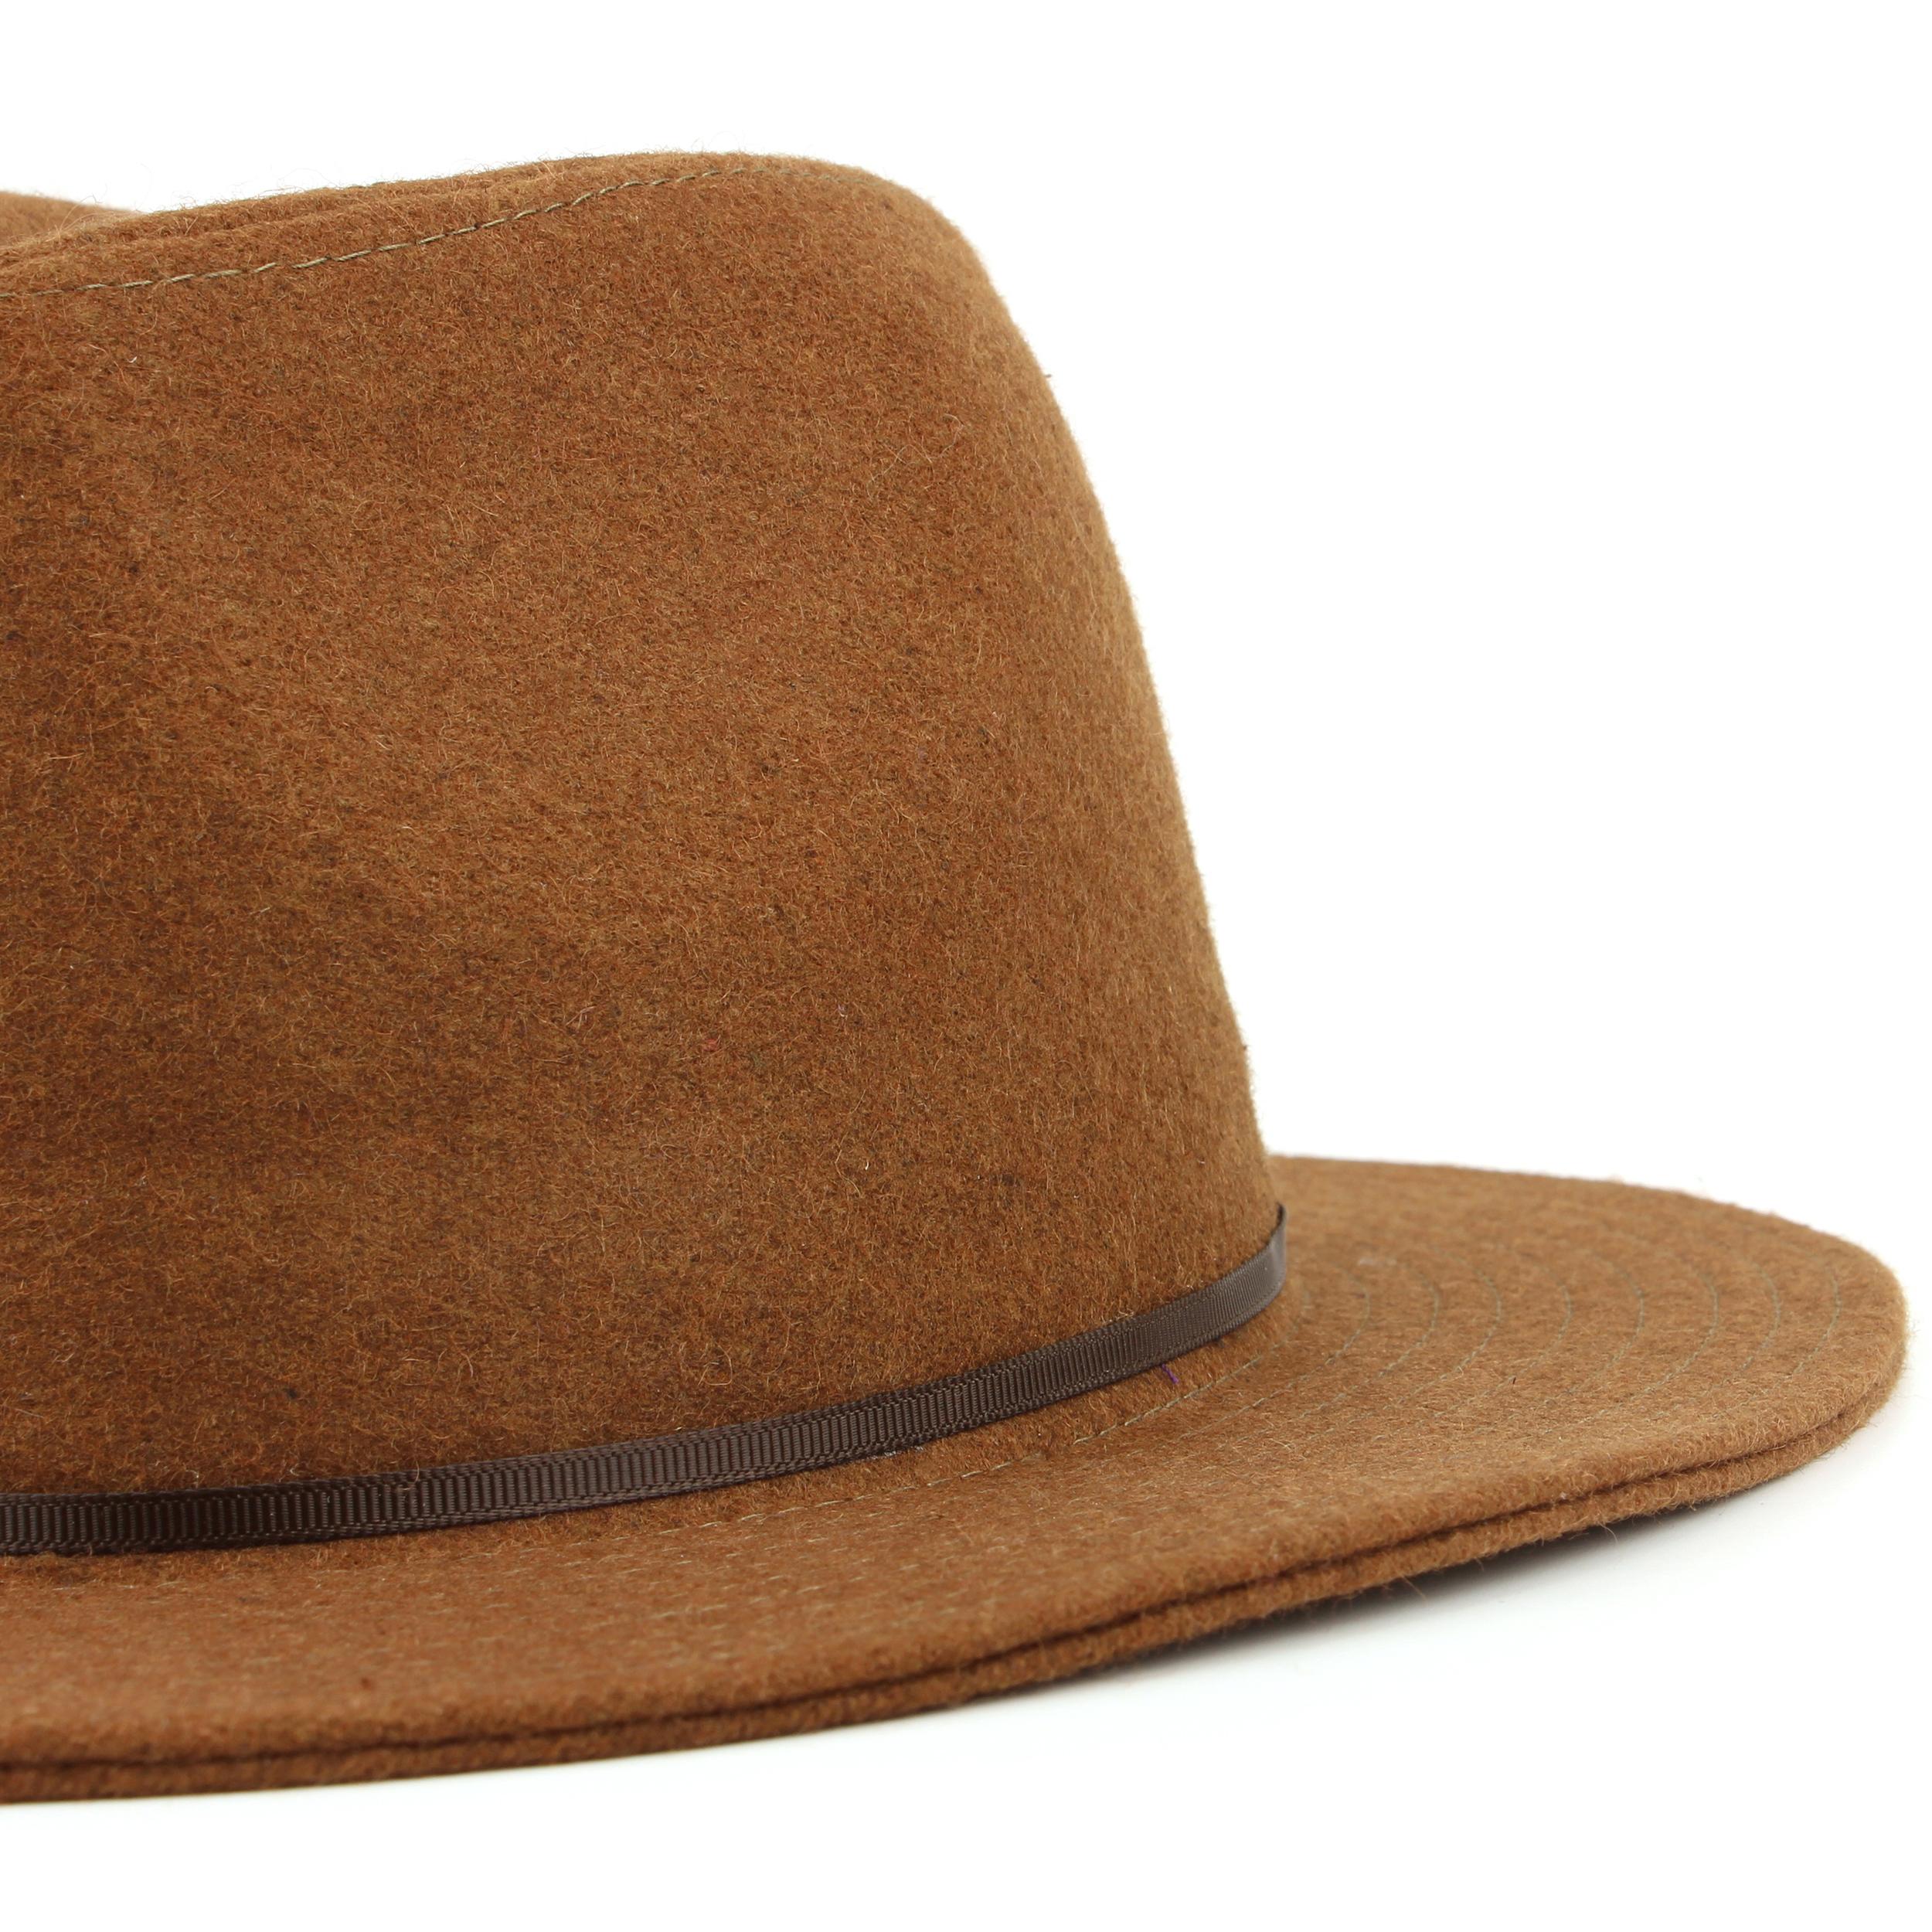 Sombrero-Fedora-Mujer-Borde-Ancho-Fieltro-de-Lana-Campana-Vintage-Sol-Panama miniatura 7